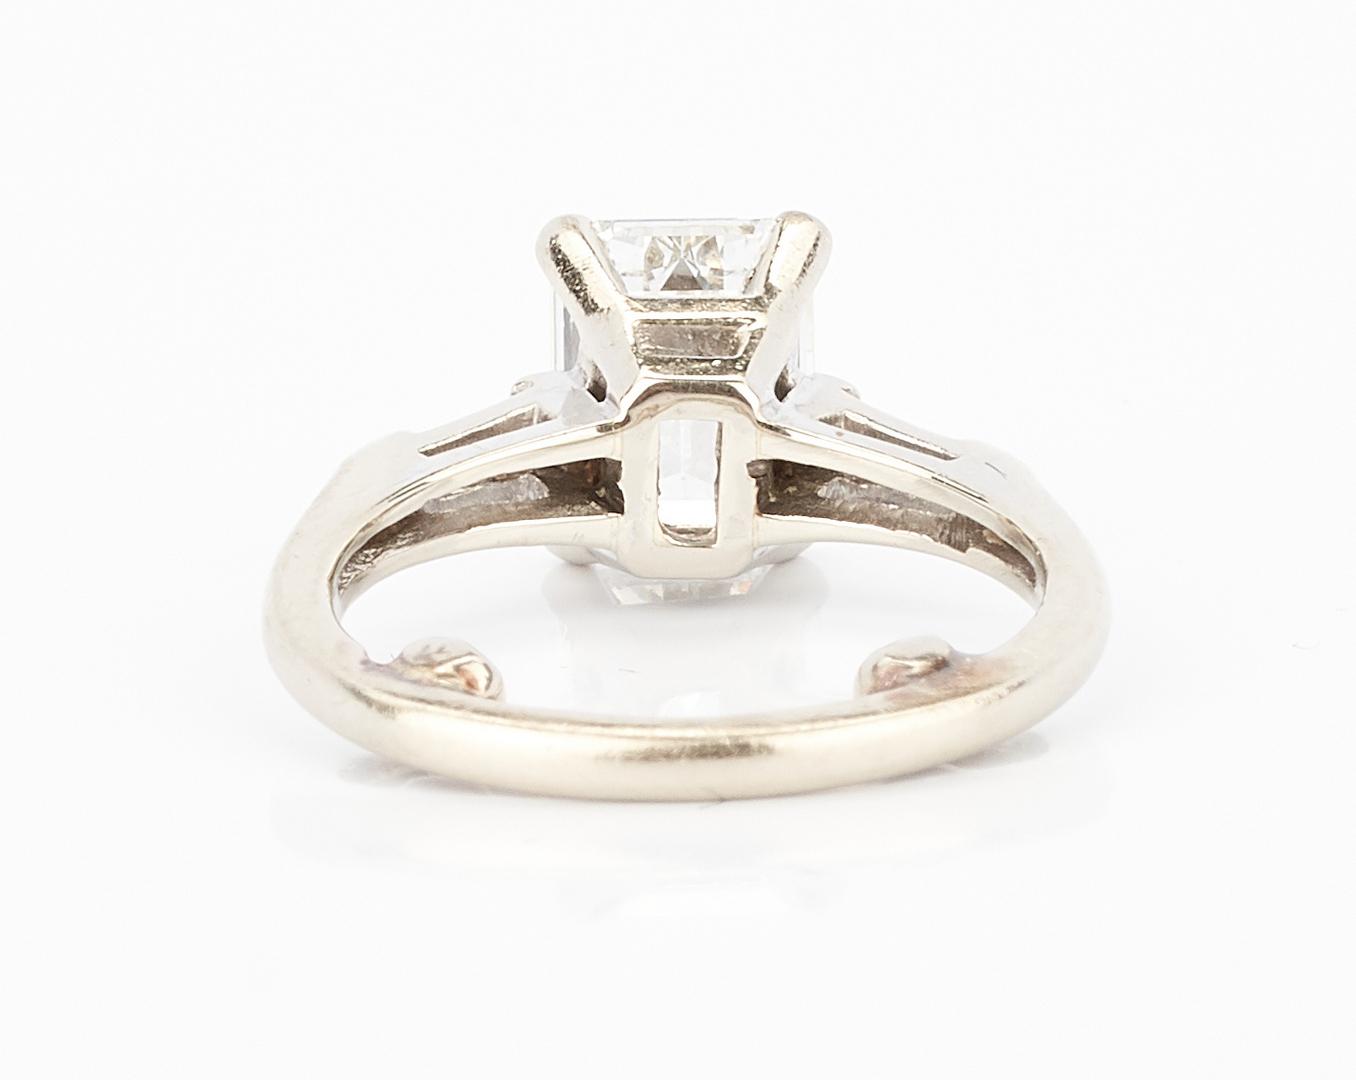 Lot 212: 14K 1 Carat Emerald Cut Diamond Engagement Ring